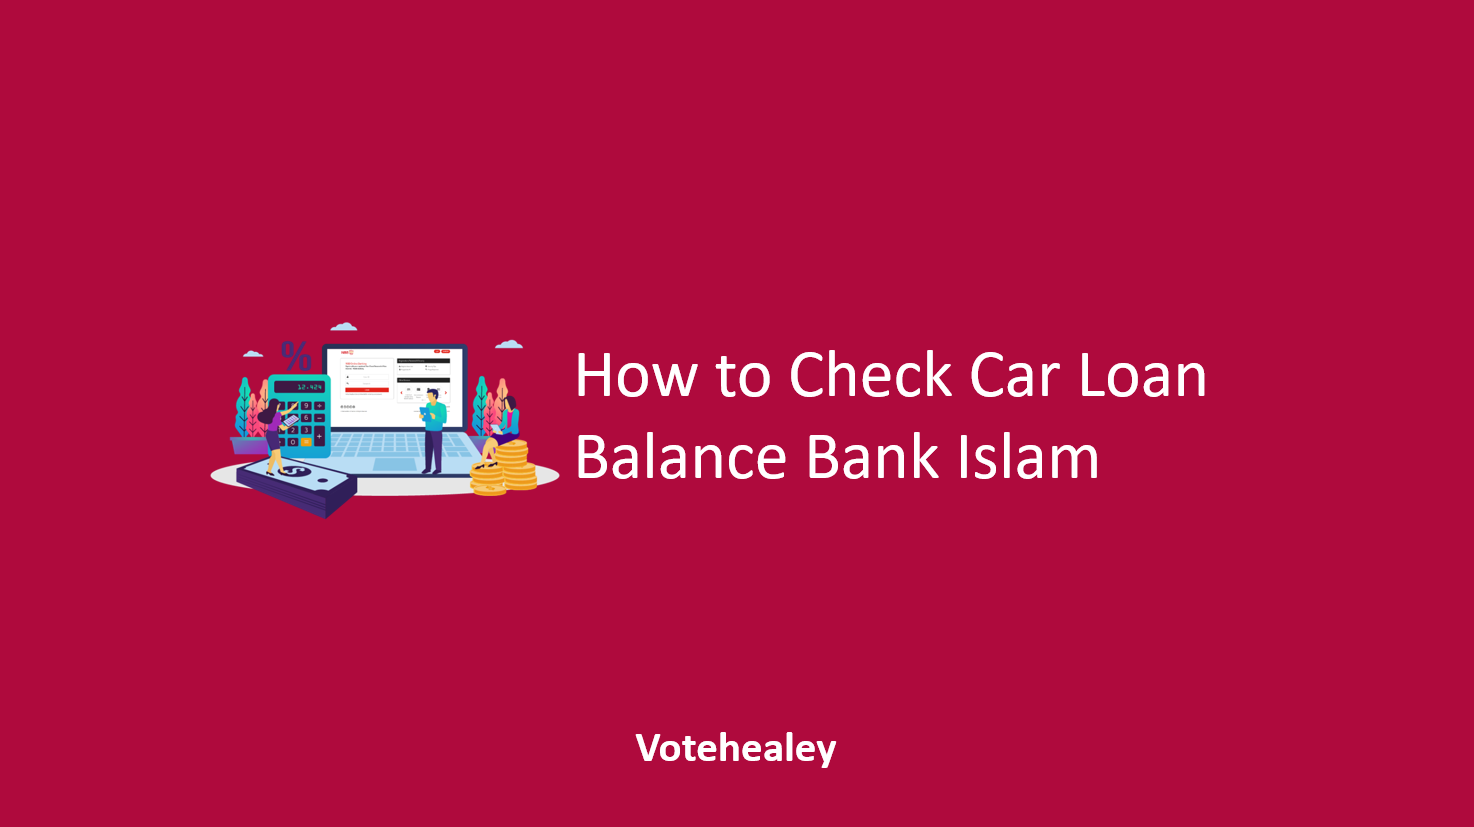 How to Check Car Loan Balance Bank Islam